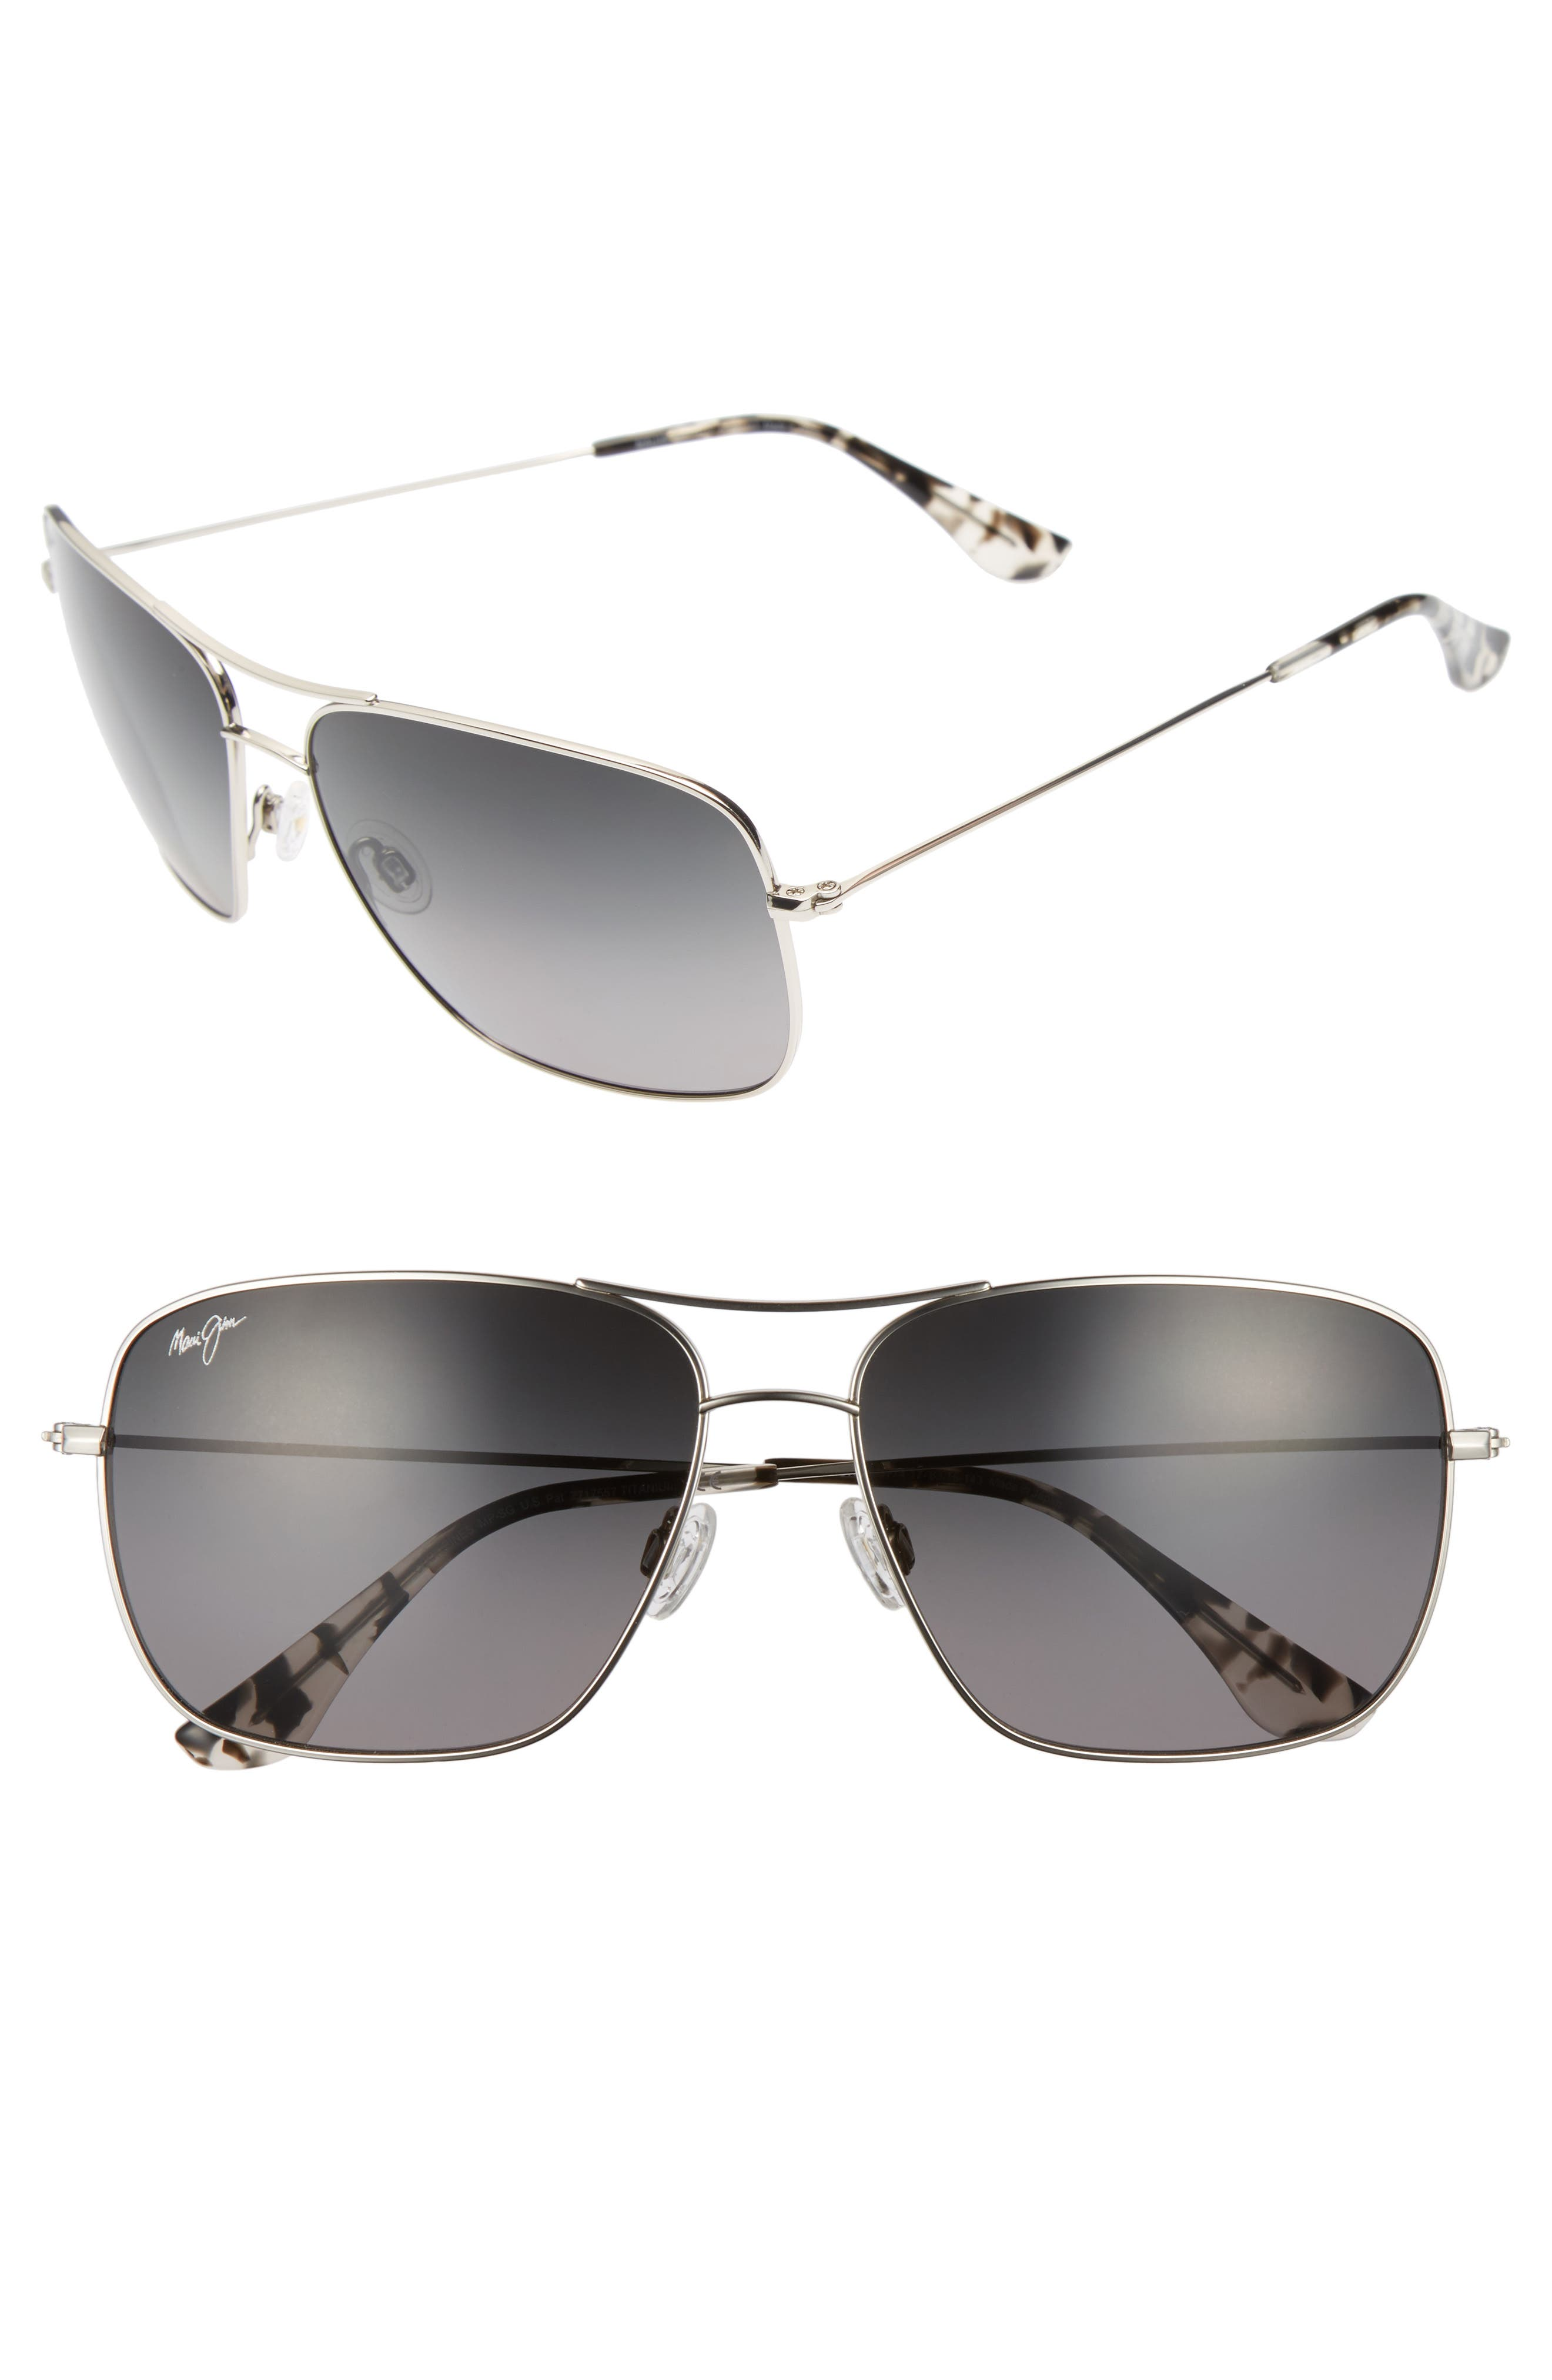 Cook Pines 63mm Polarized Titanium Aviator Sunglasses,                             Main thumbnail 2, color,